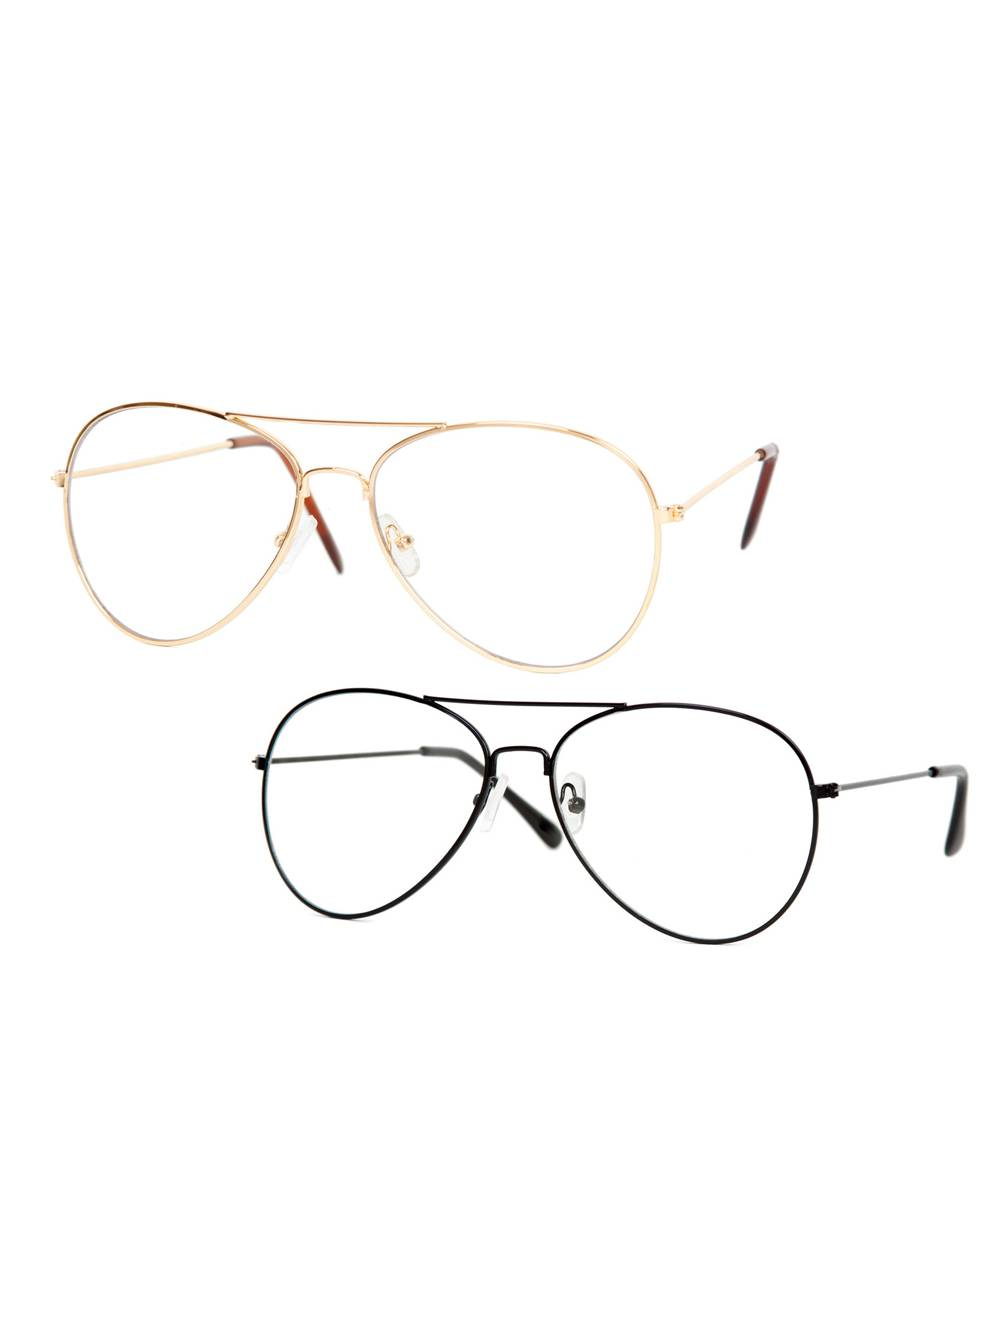 Gravity Shades Clear Lens Gold Aviator Sunglasses